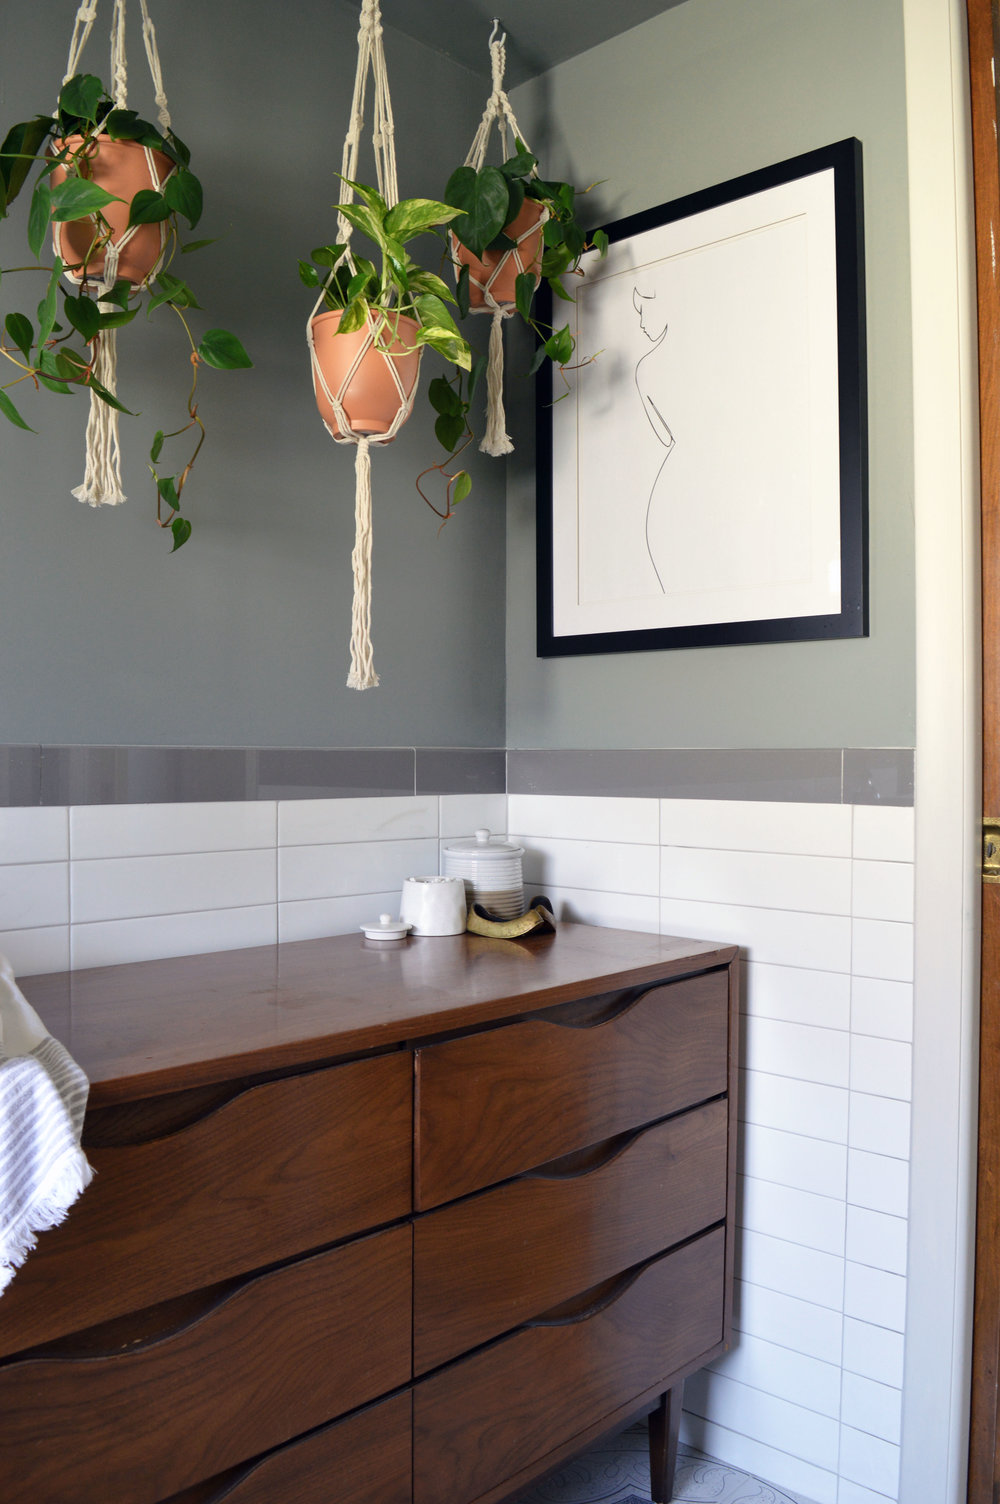 Orlando Interior Designer's Guest bathroom renovation with hanging planters